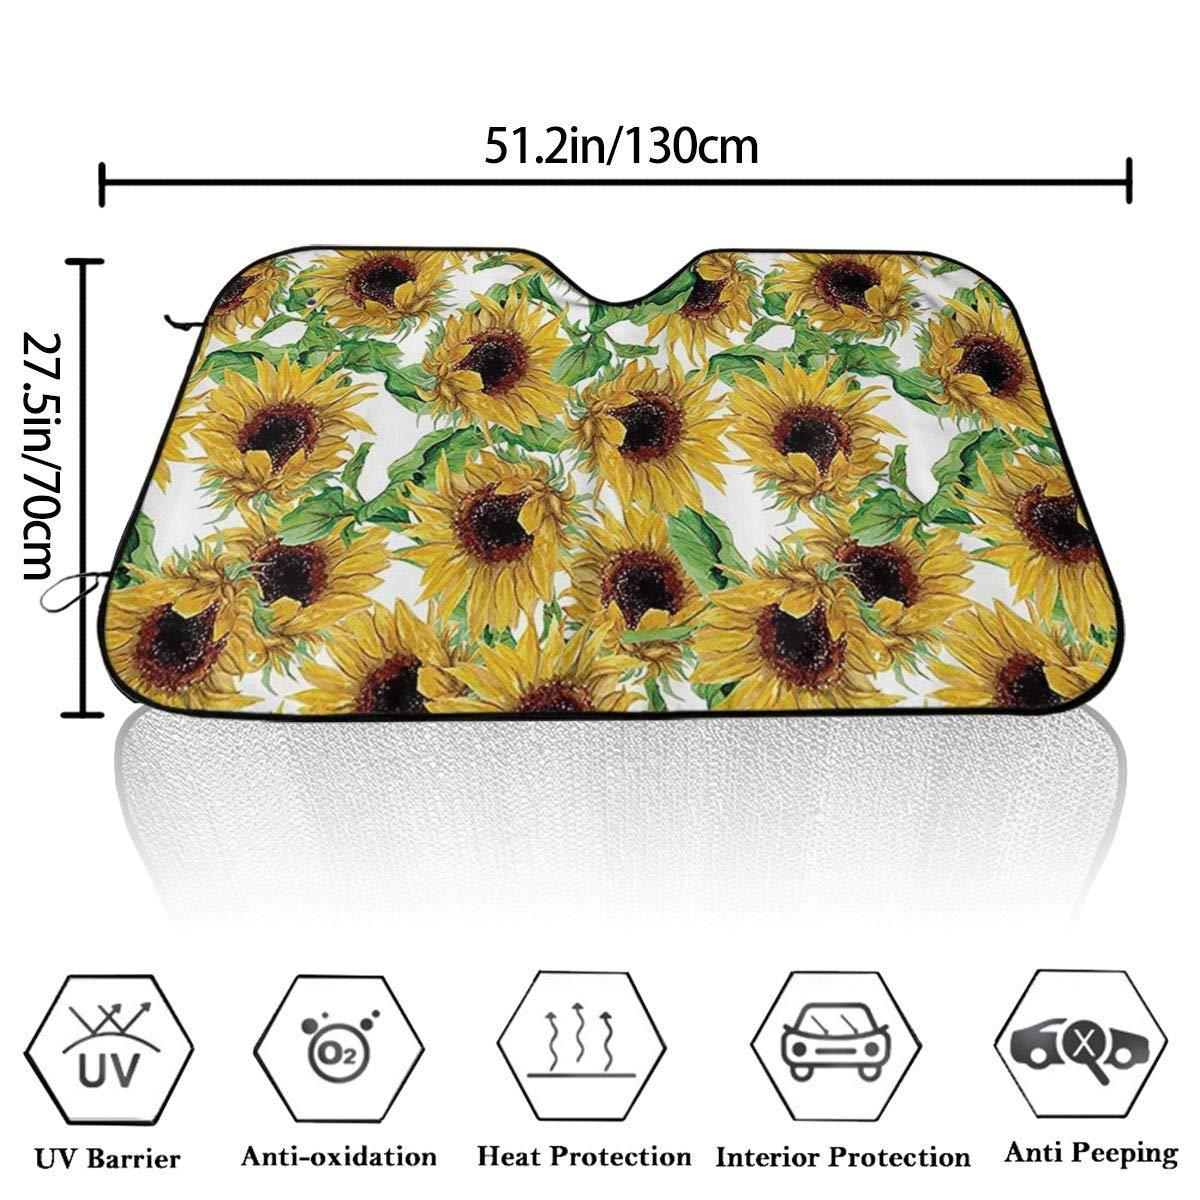 Dried Sunflowers Windshield Sun Shade Car Windows UV Ray Reflector Outdoor Vehicle Accessories